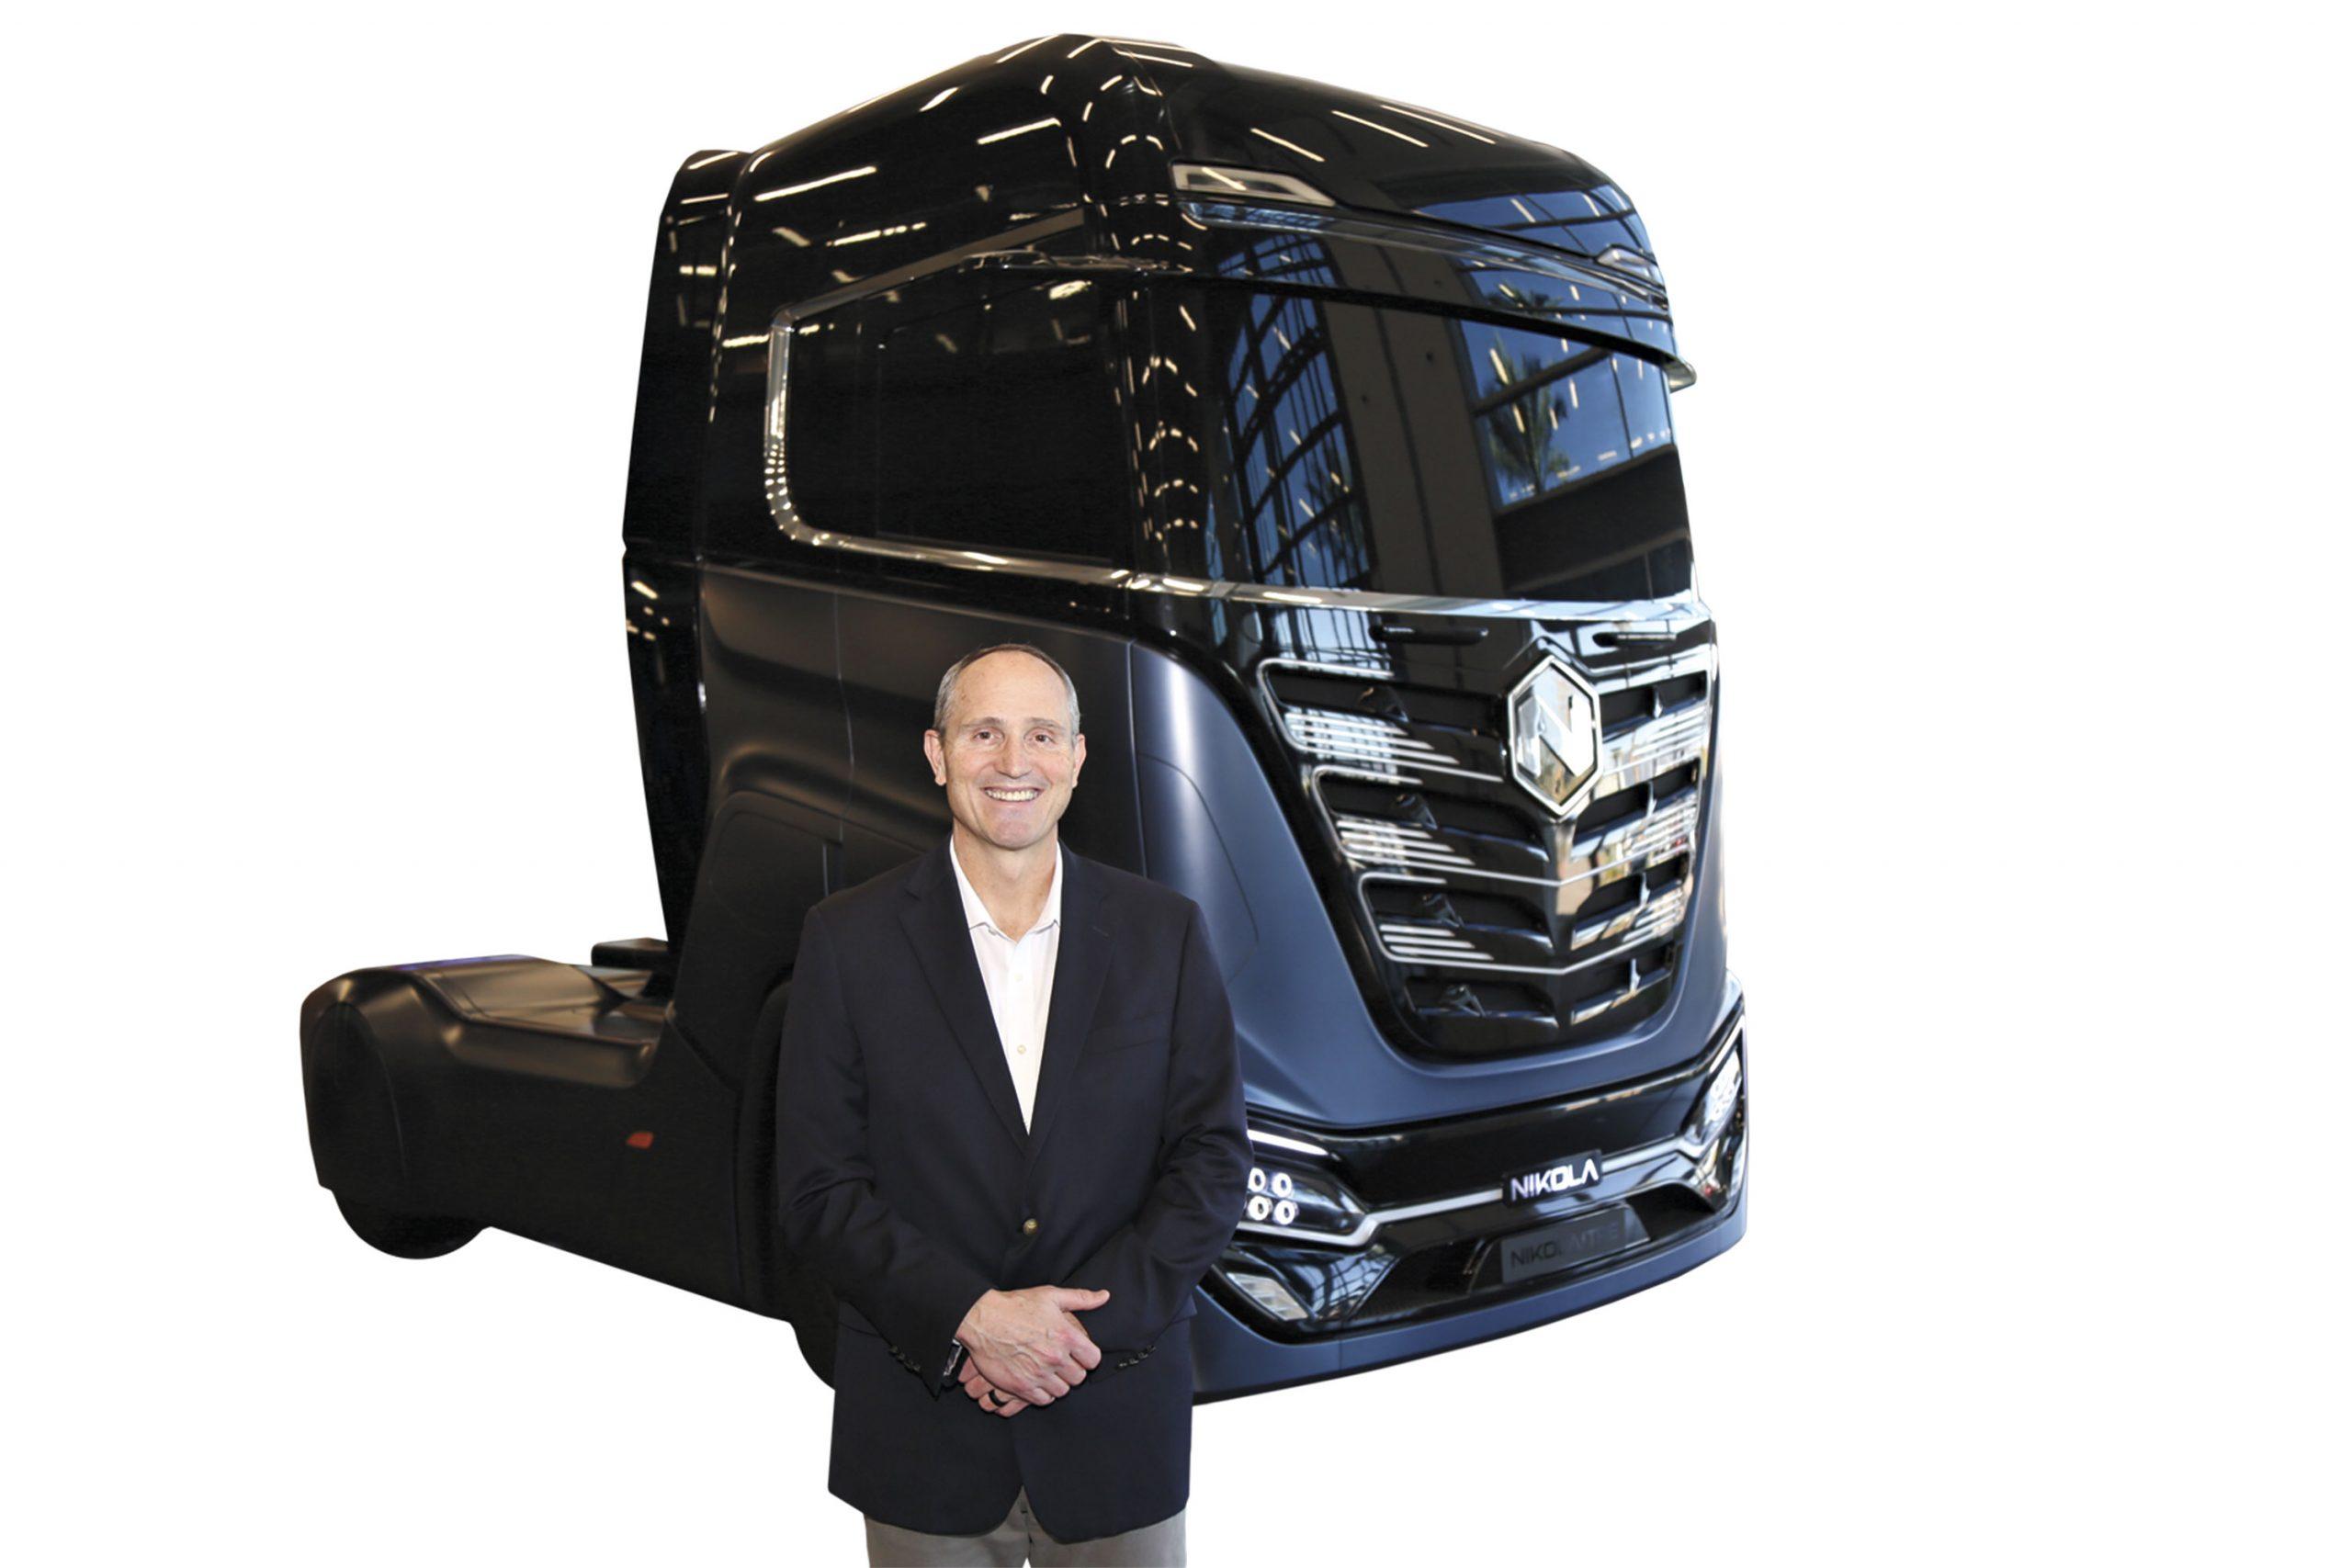 CEO Mark Russell with Nikola's model Tre semi-truck; Photo by Angelina Aragon